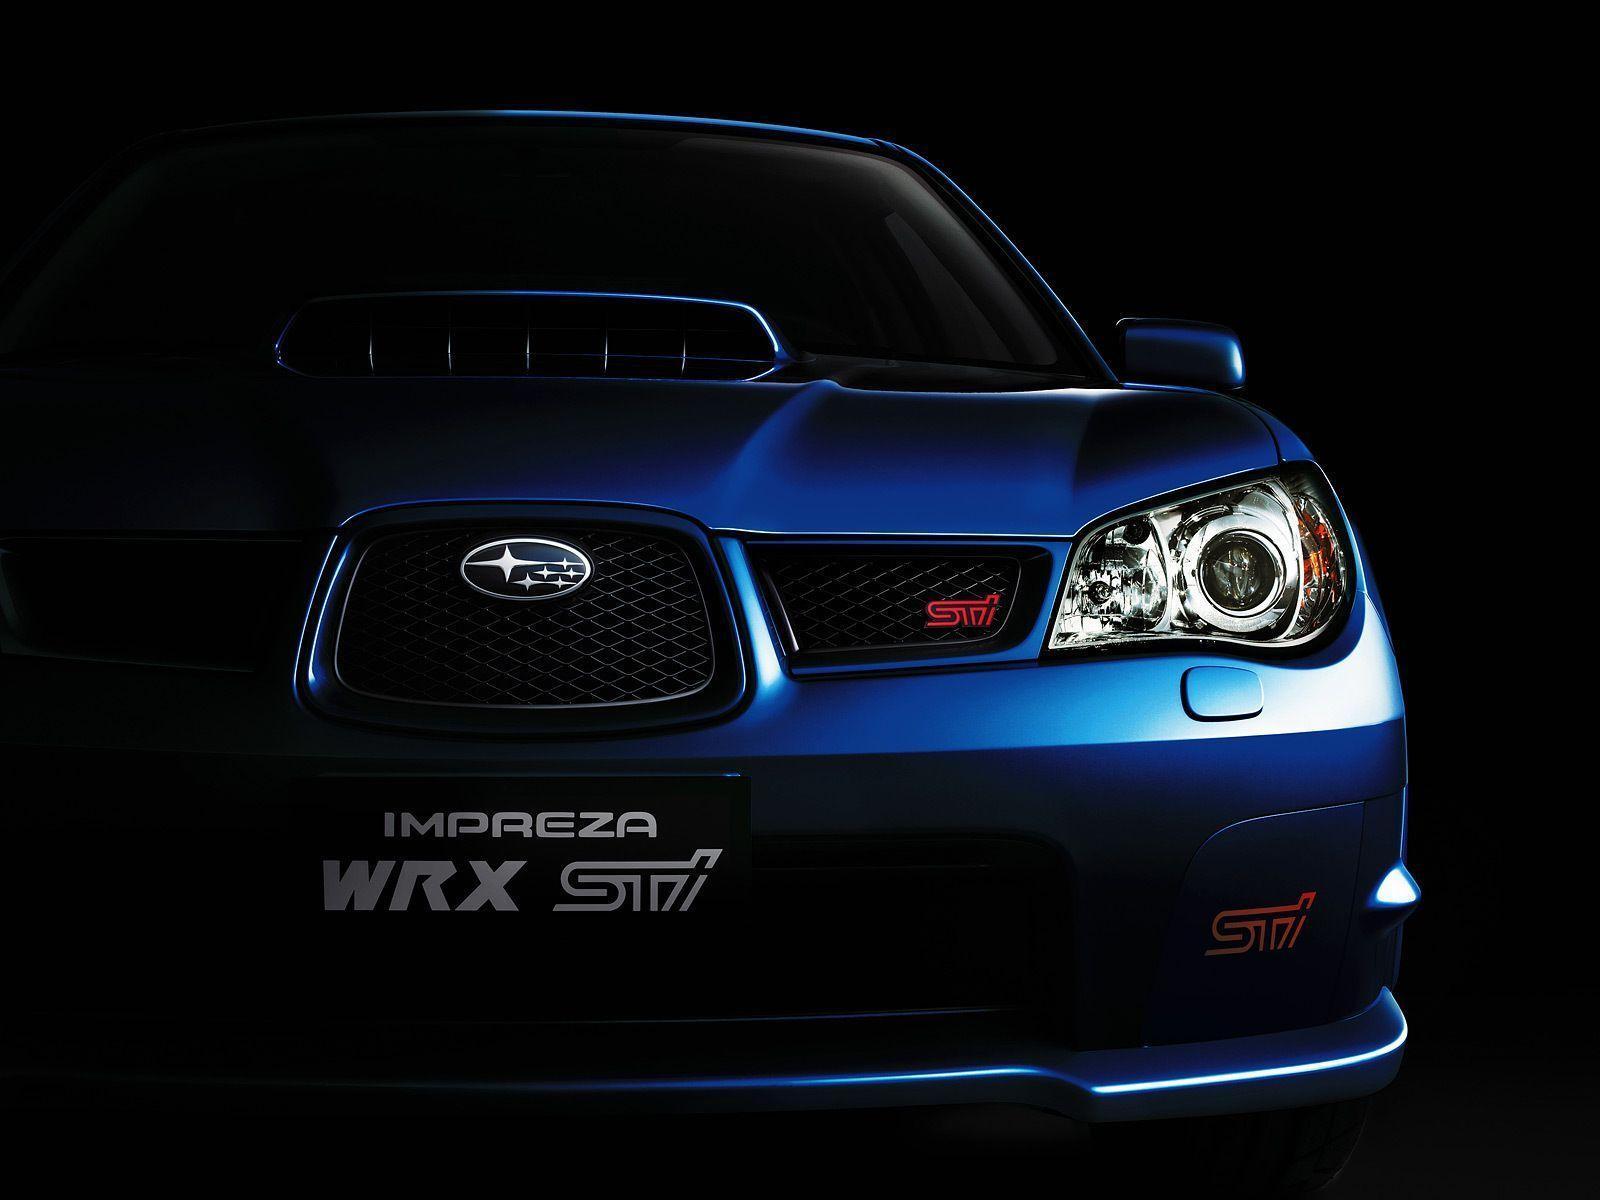 Wrx Sti 0 60 >> Subaru WRX Wallpapers - Wallpaper Cave